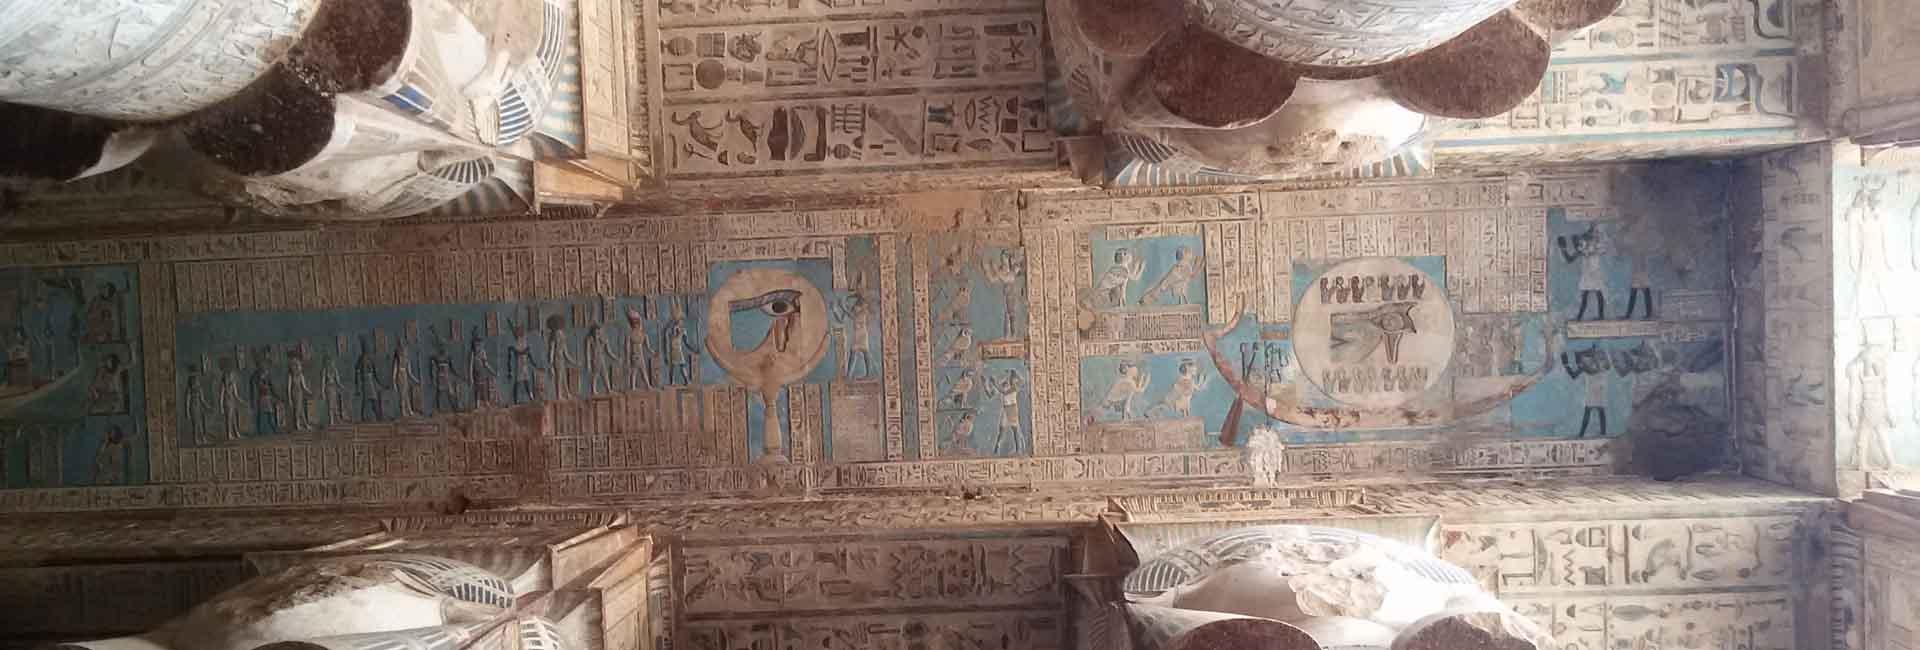 Dendera Temple Ceiling